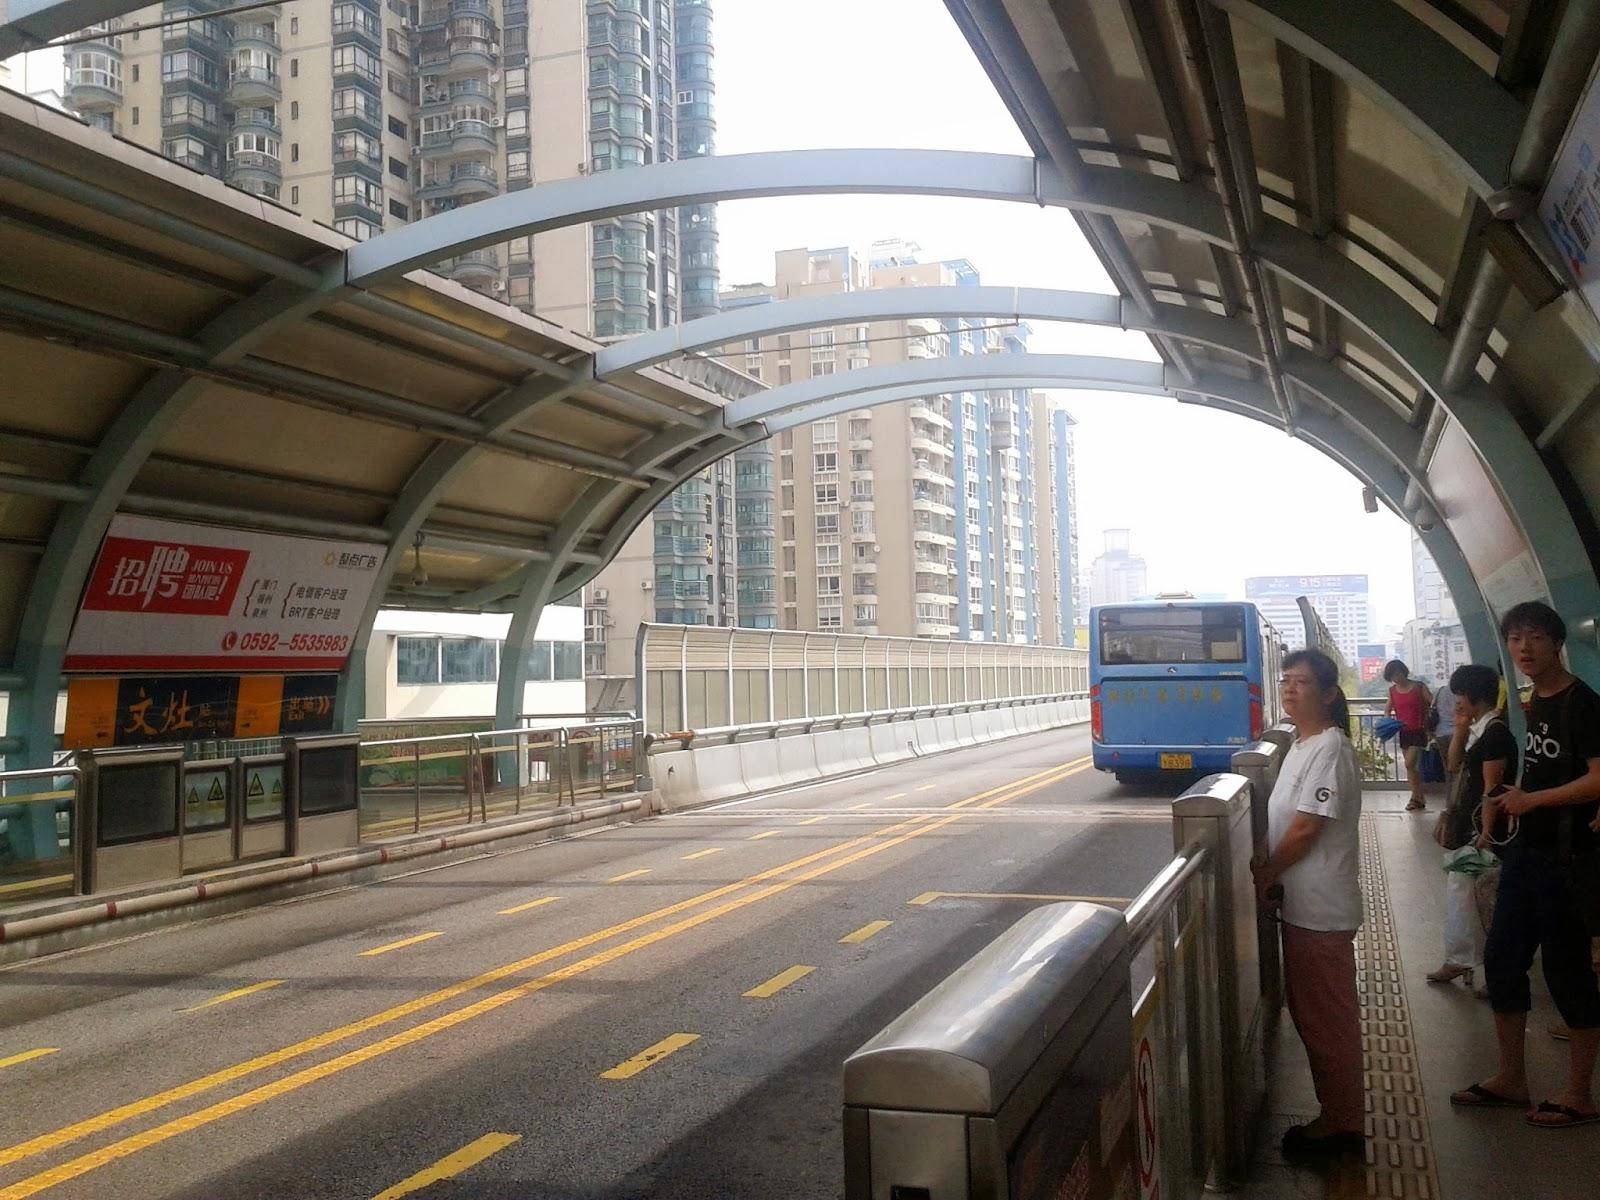 xiamen s impressive brt service runs on elevated viaducts